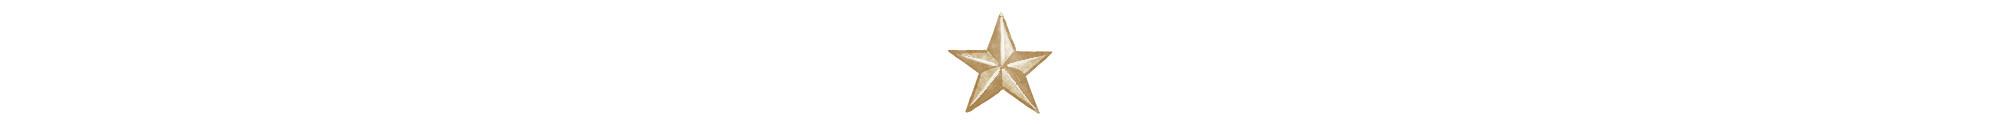 general_stars_sequoia_basecamp